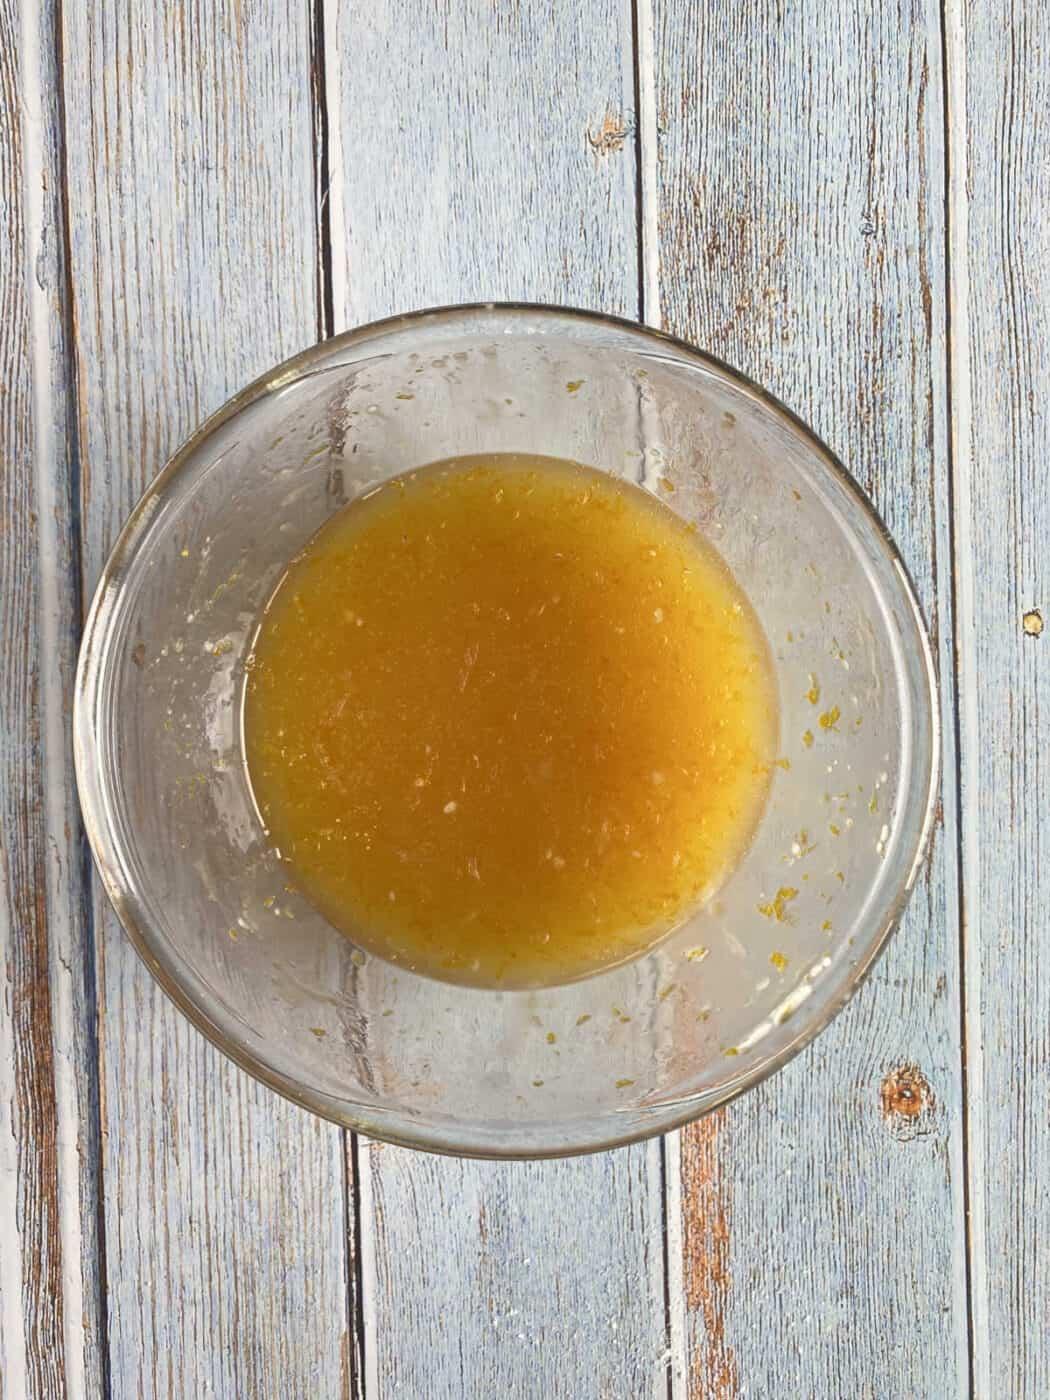 orange juice, orange zest and powdered sugar, mixed in a glass bowl